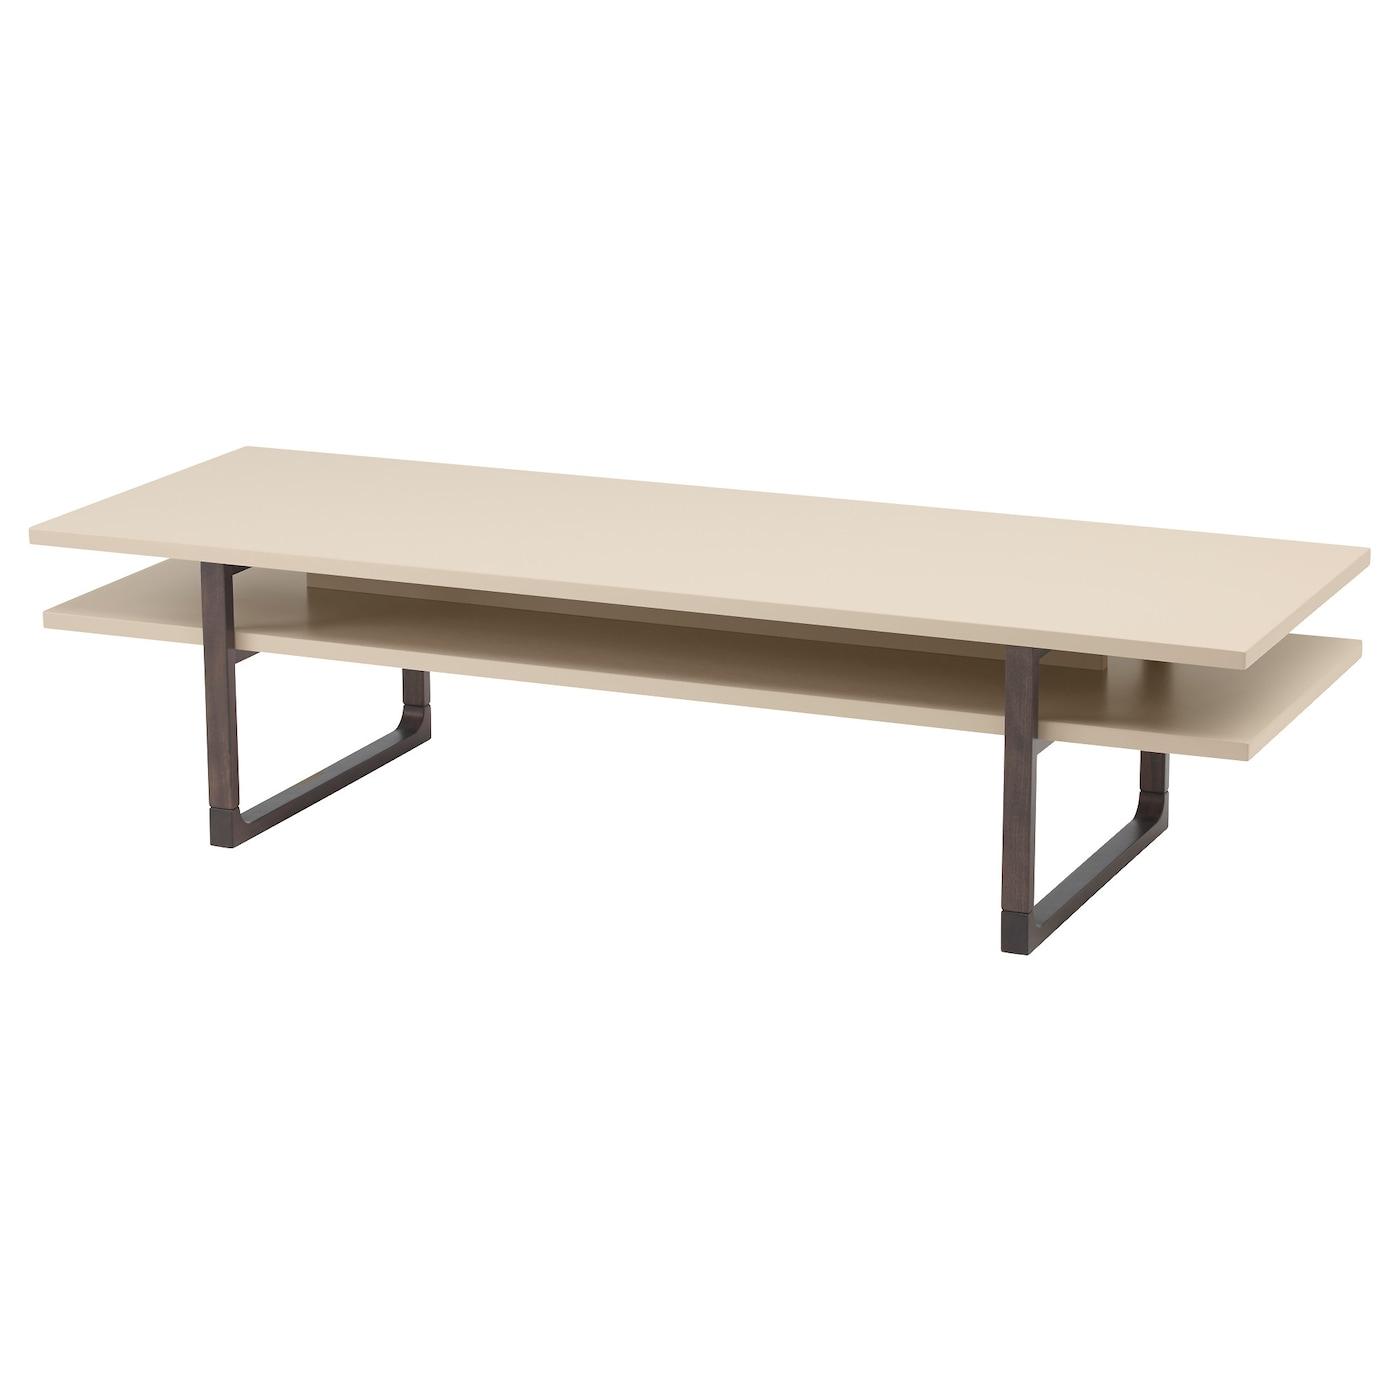 Rissna table basse beige 160x55 cm ikea for Table ikea 5 99